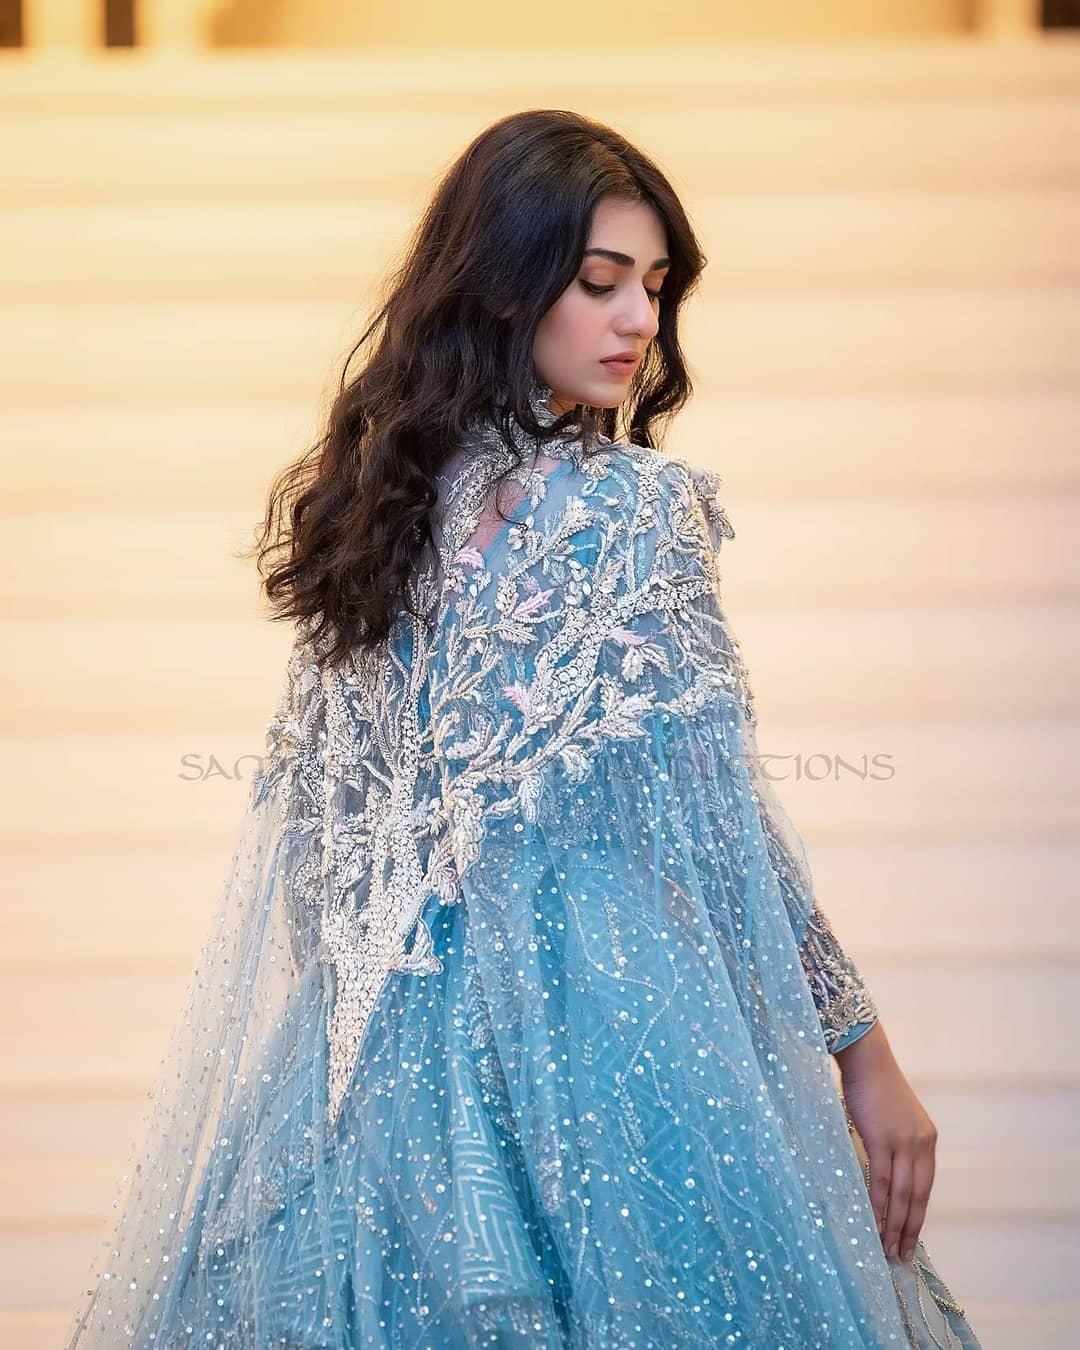 Pakistani Model Sarah Khan Photoshoot (3)